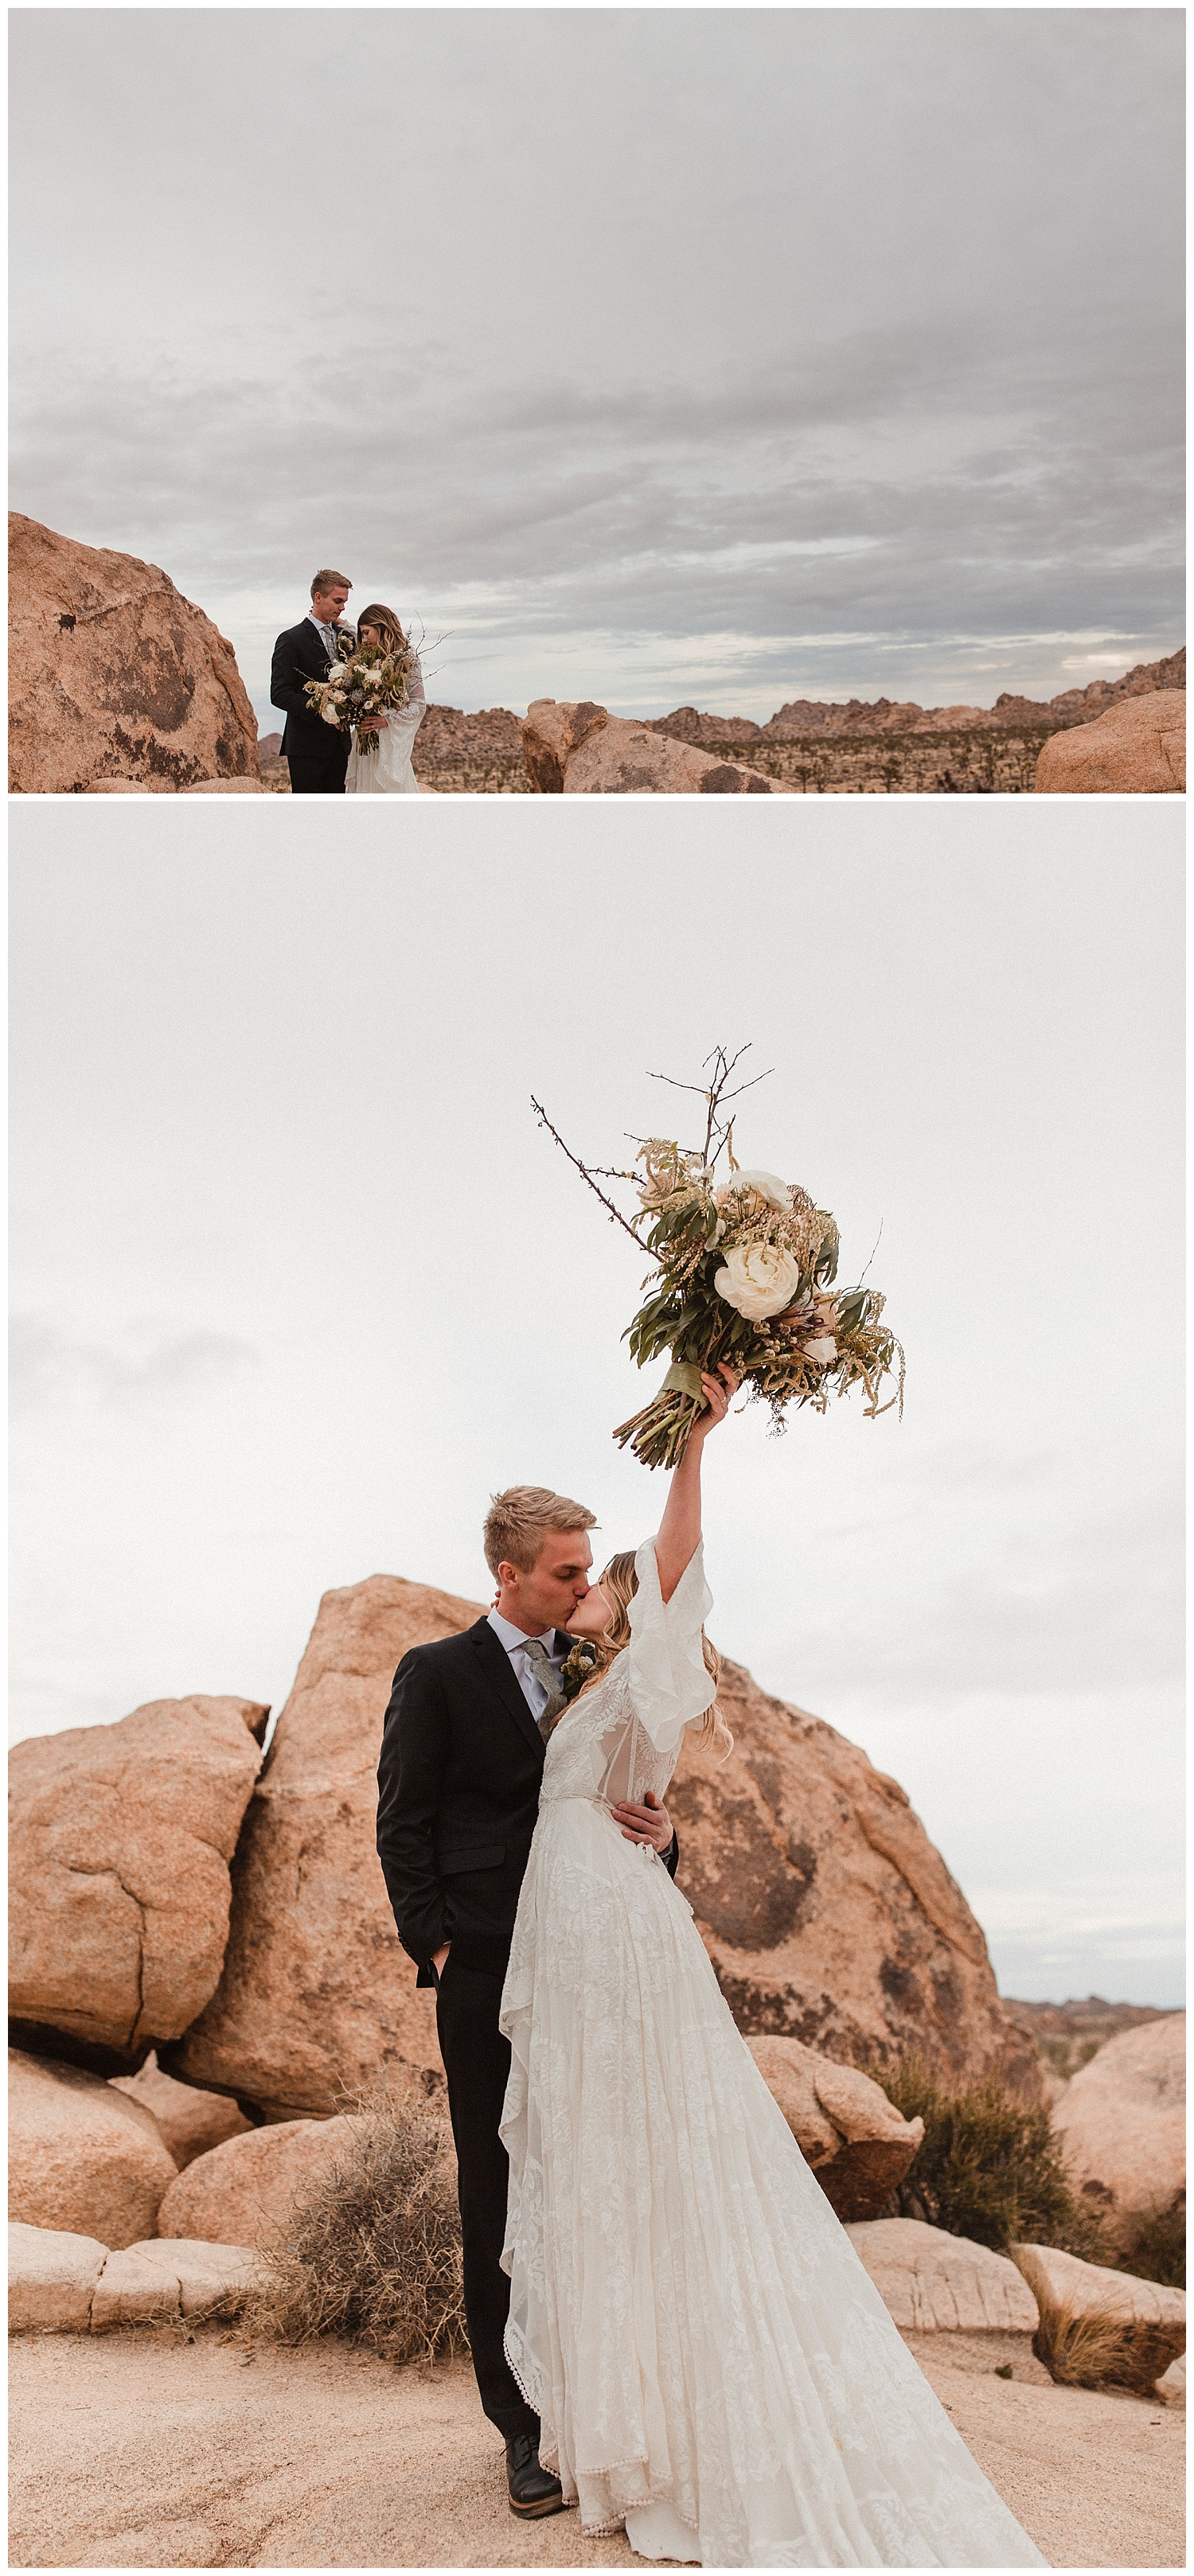 romantic_elopement_joshua_tree_adventurous_wedding_photographer_romantic_intimate_wedding_0028.jpg